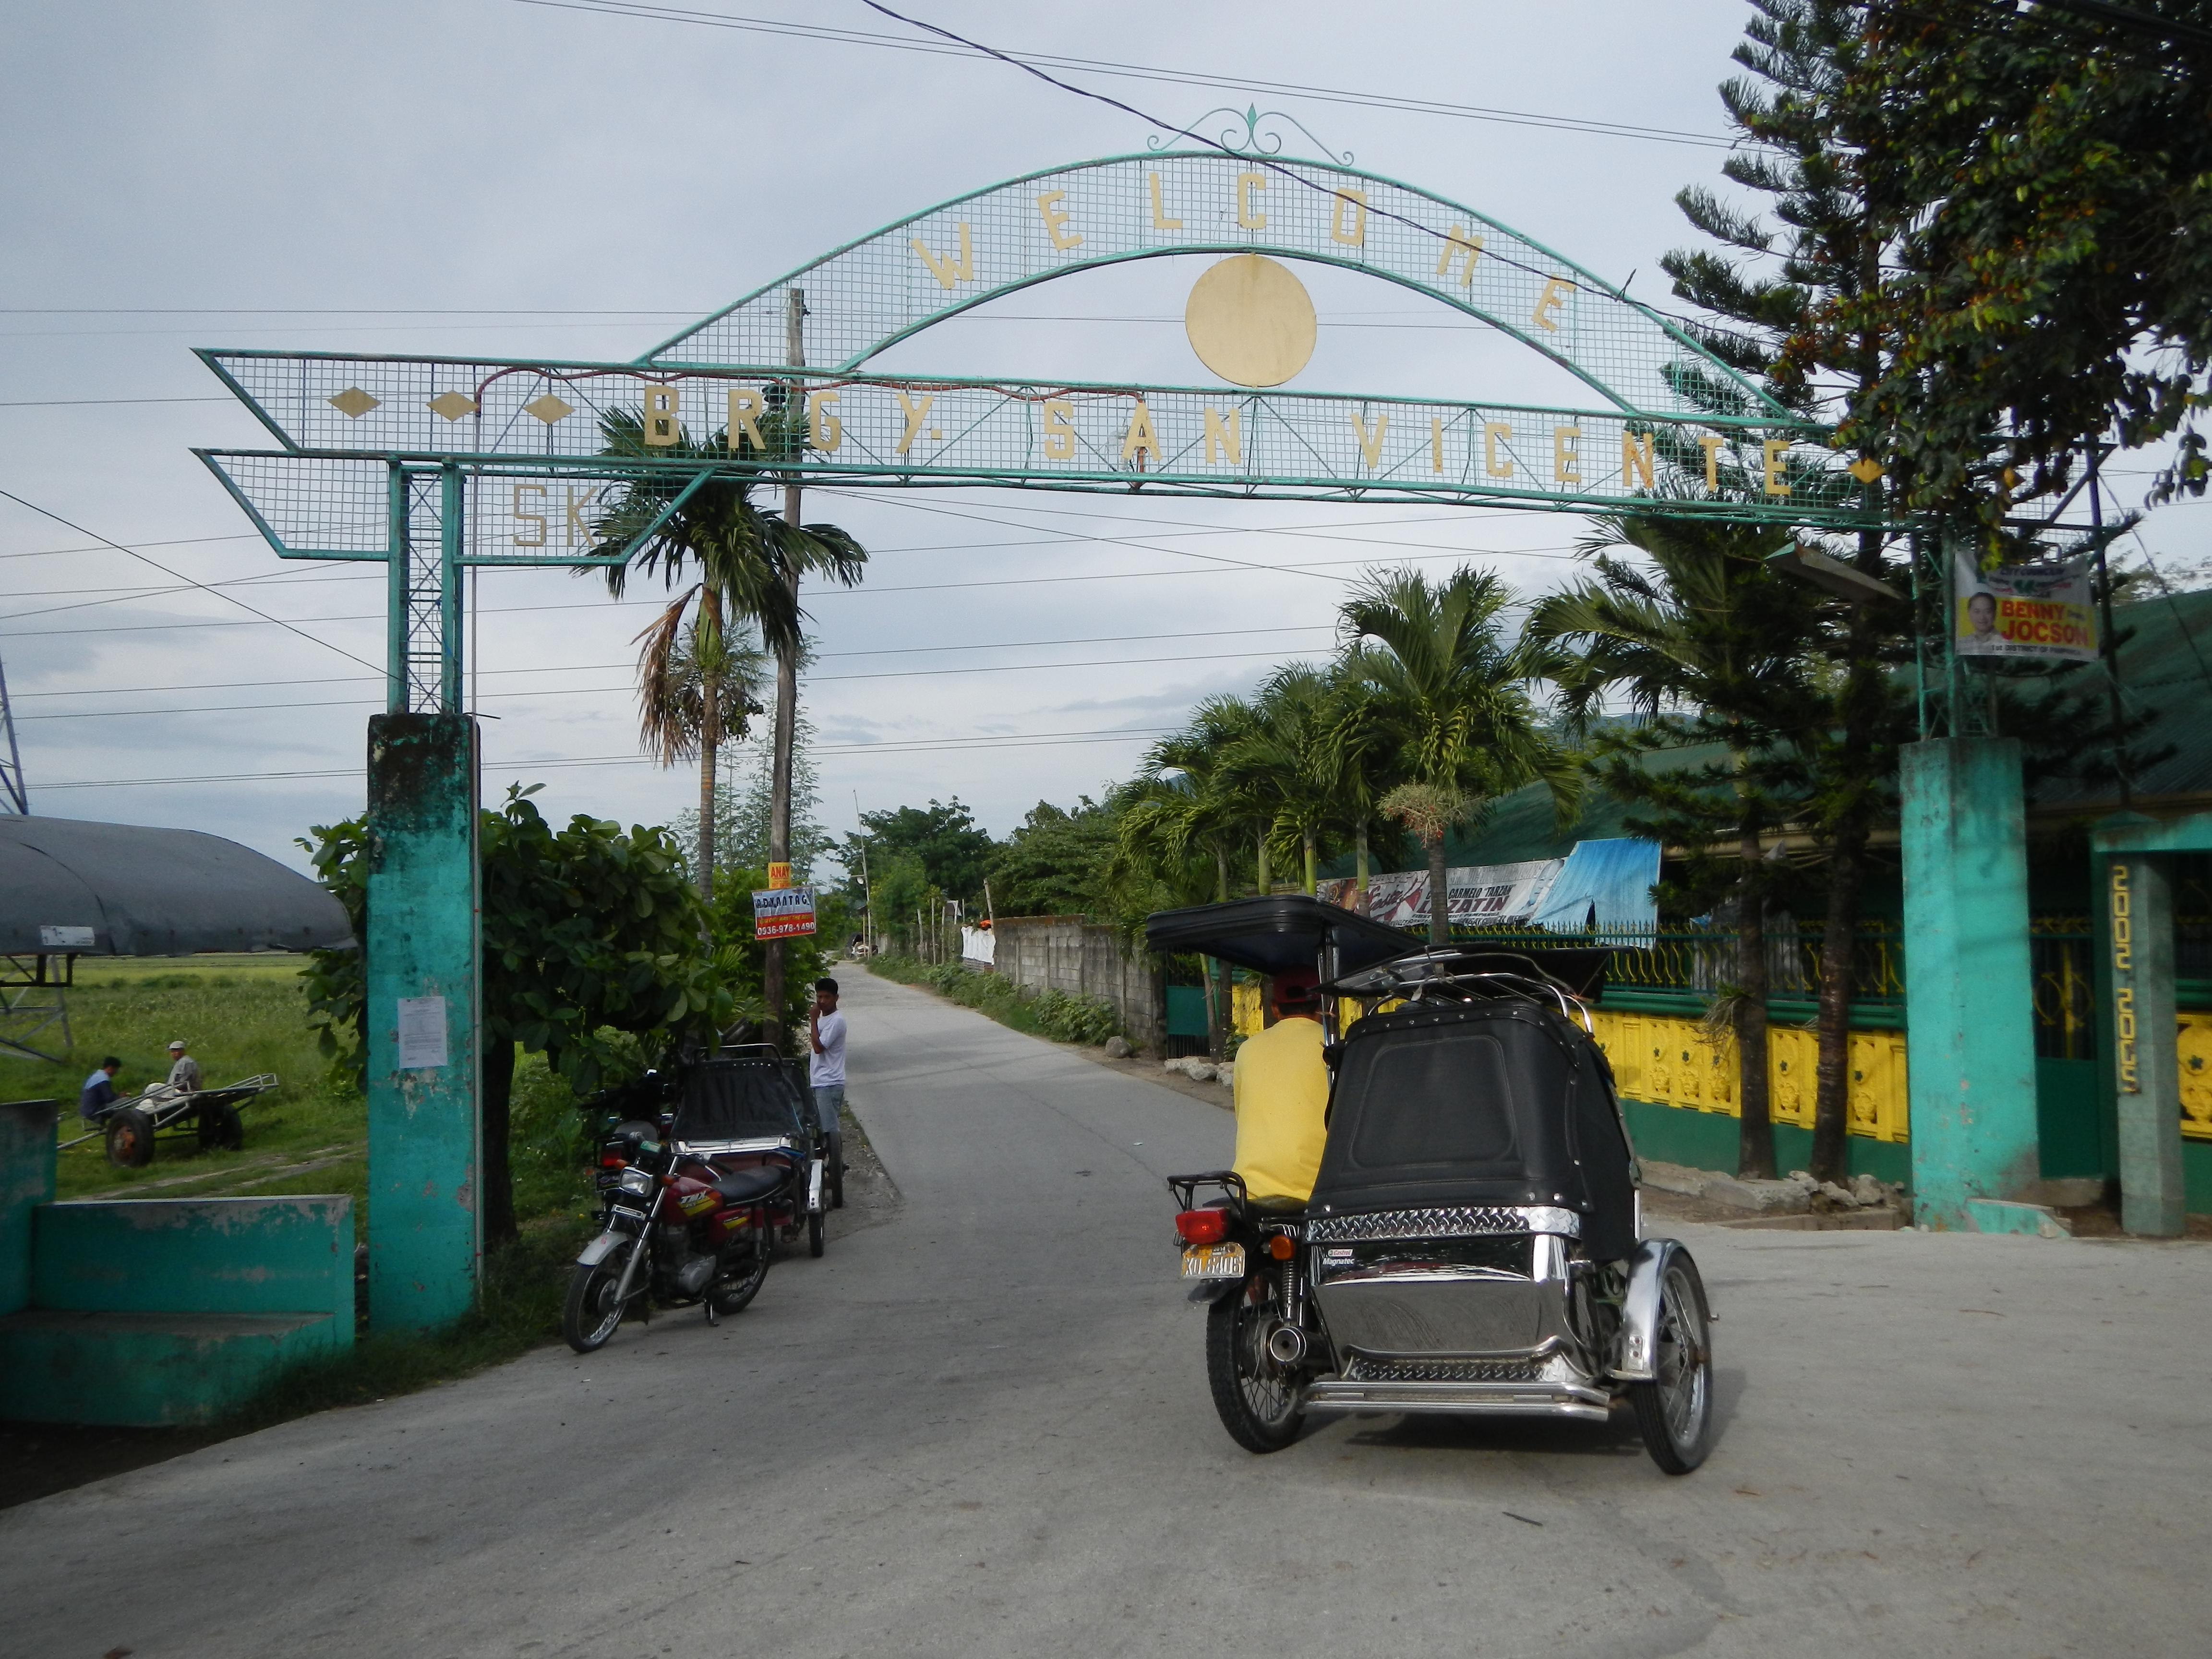 swot analysis in arayat pampanga Pampanga tourist attractions: angeles clark san fernando mabalacat pampanga  philippines (official website of philtravelcentercom arayat swot analysis.